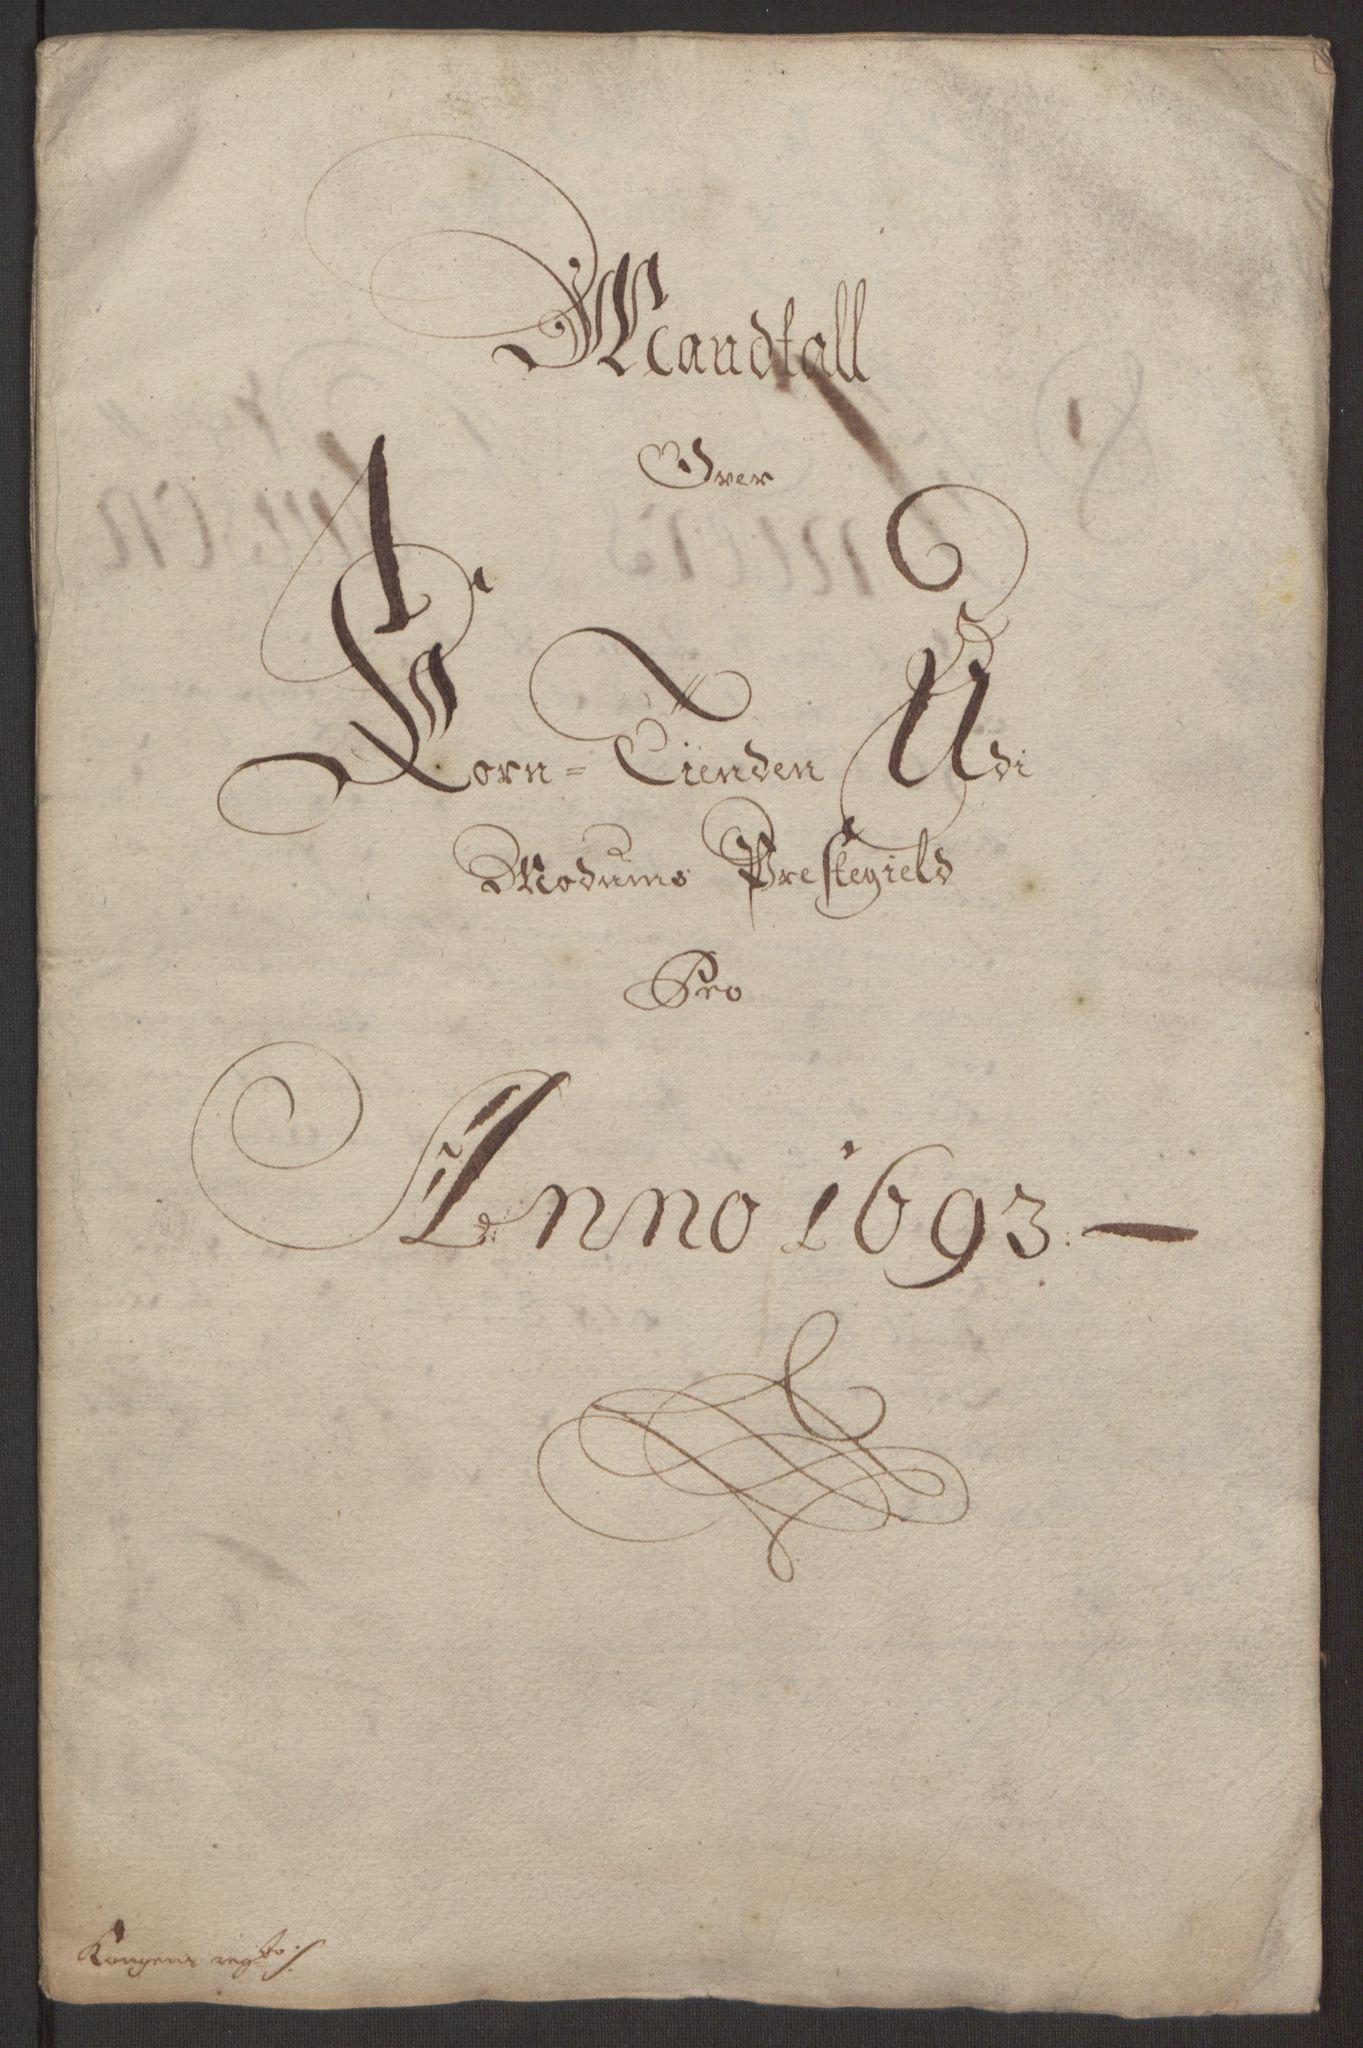 RA, Rentekammeret inntil 1814, Reviderte regnskaper, Fogderegnskap, R25/L1682: Fogderegnskap Buskerud, 1693, s. 21